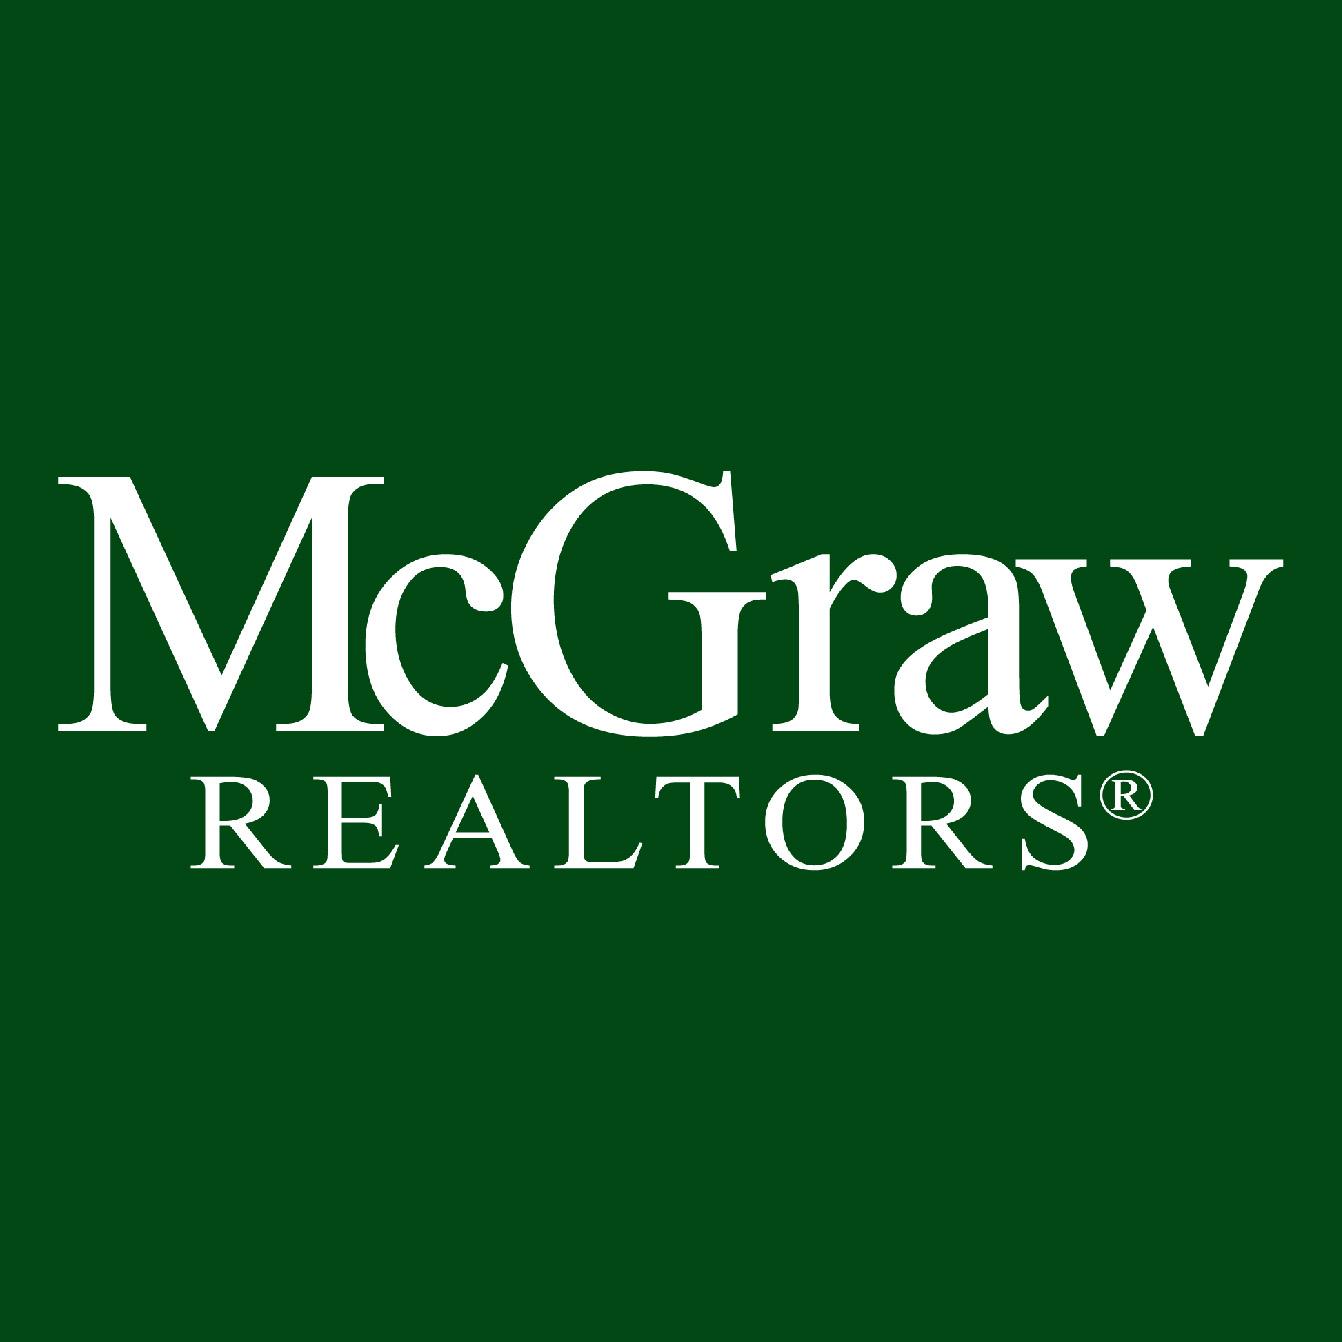 McGraw Realtors - Pawhuska